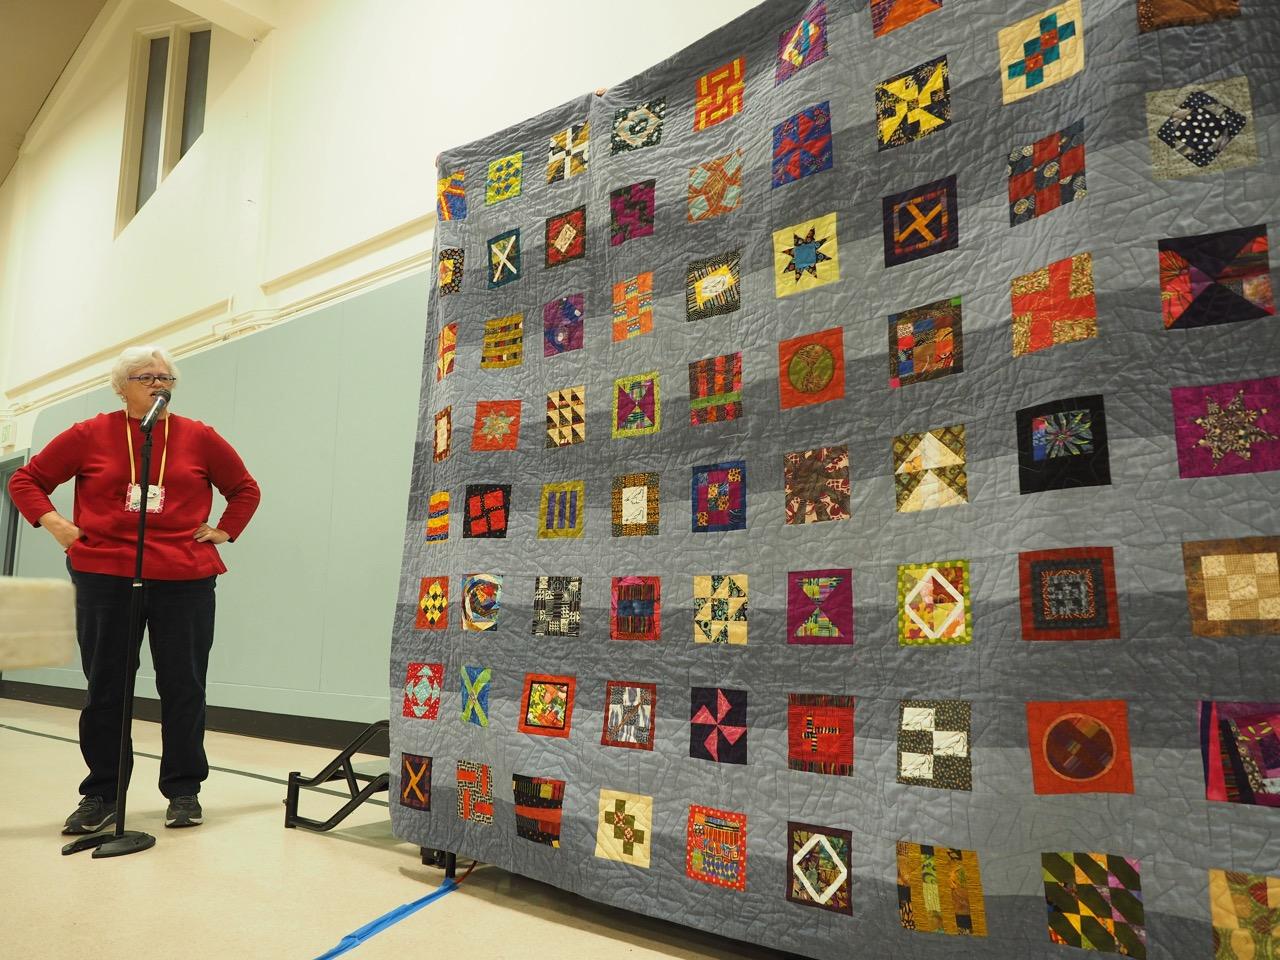 New Bed Quilt by Marjorie Elliott